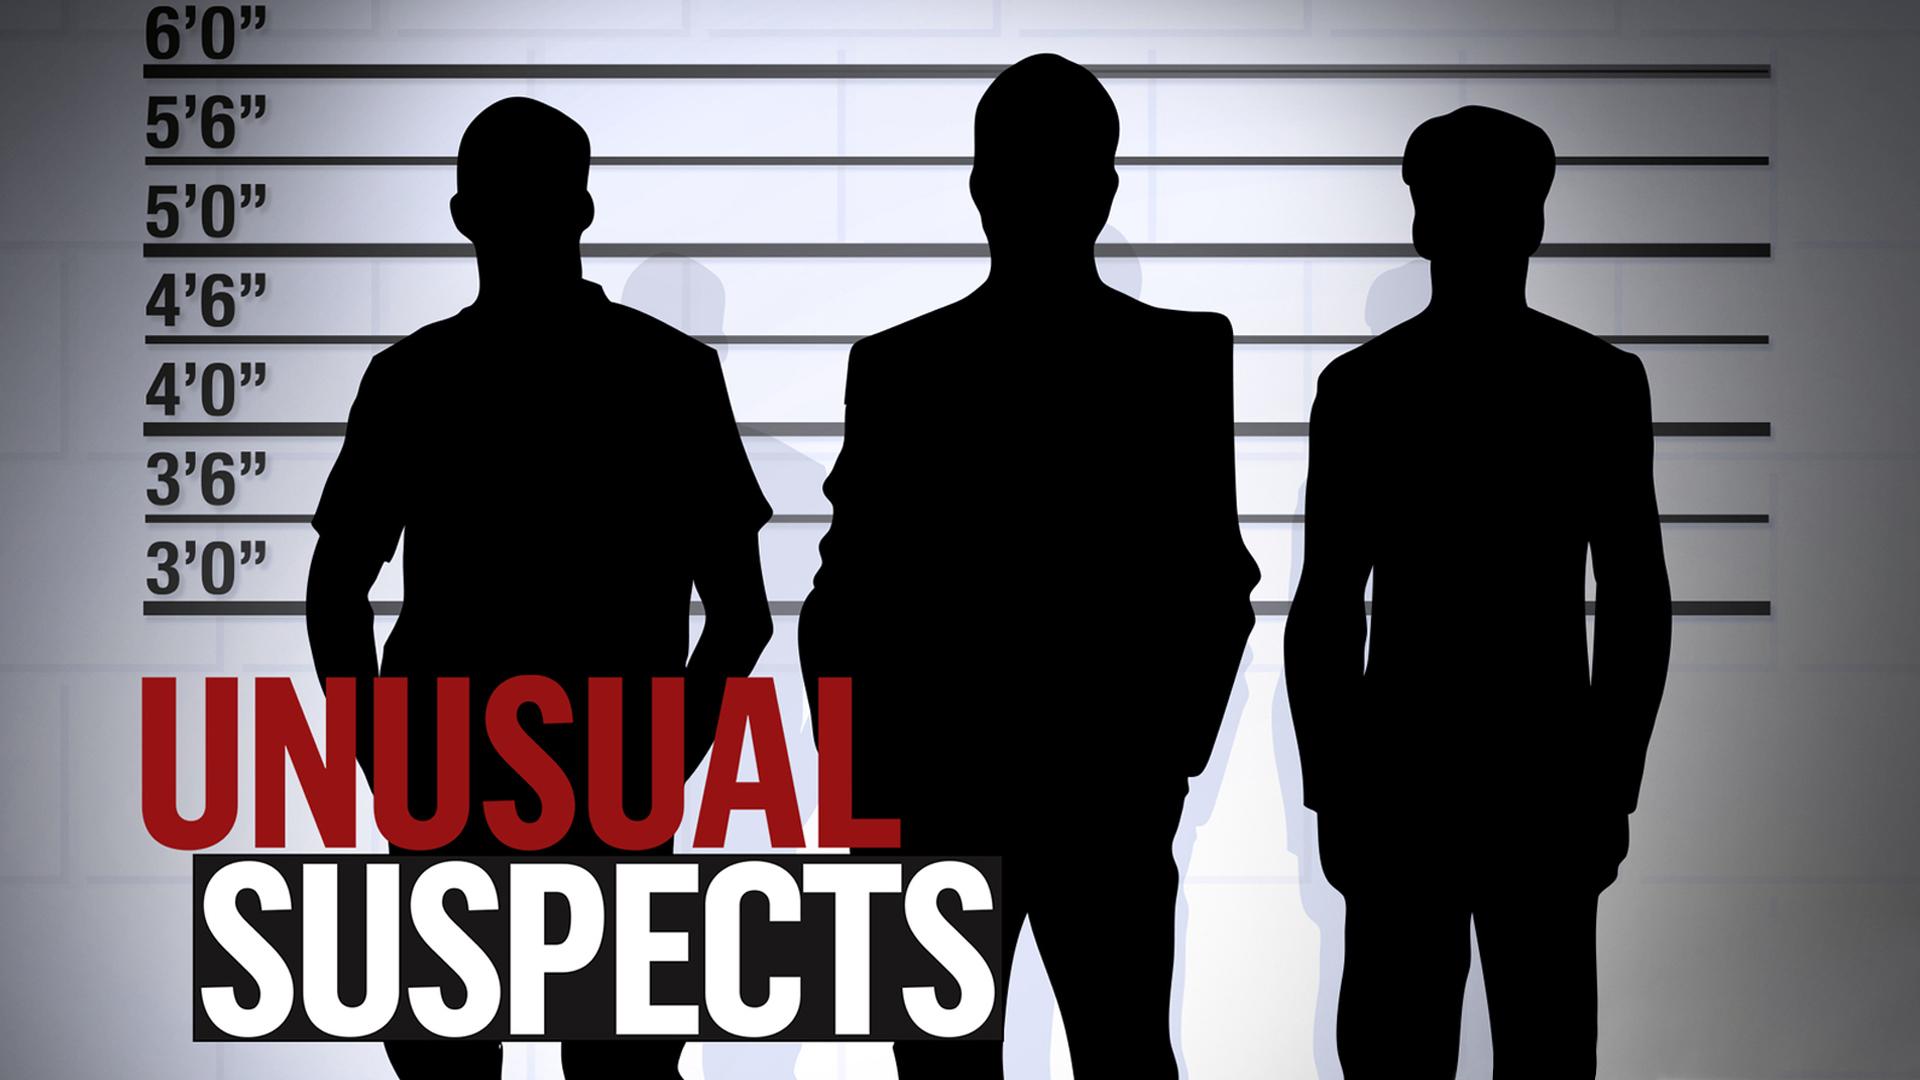 Unusual Suspects - Season 1